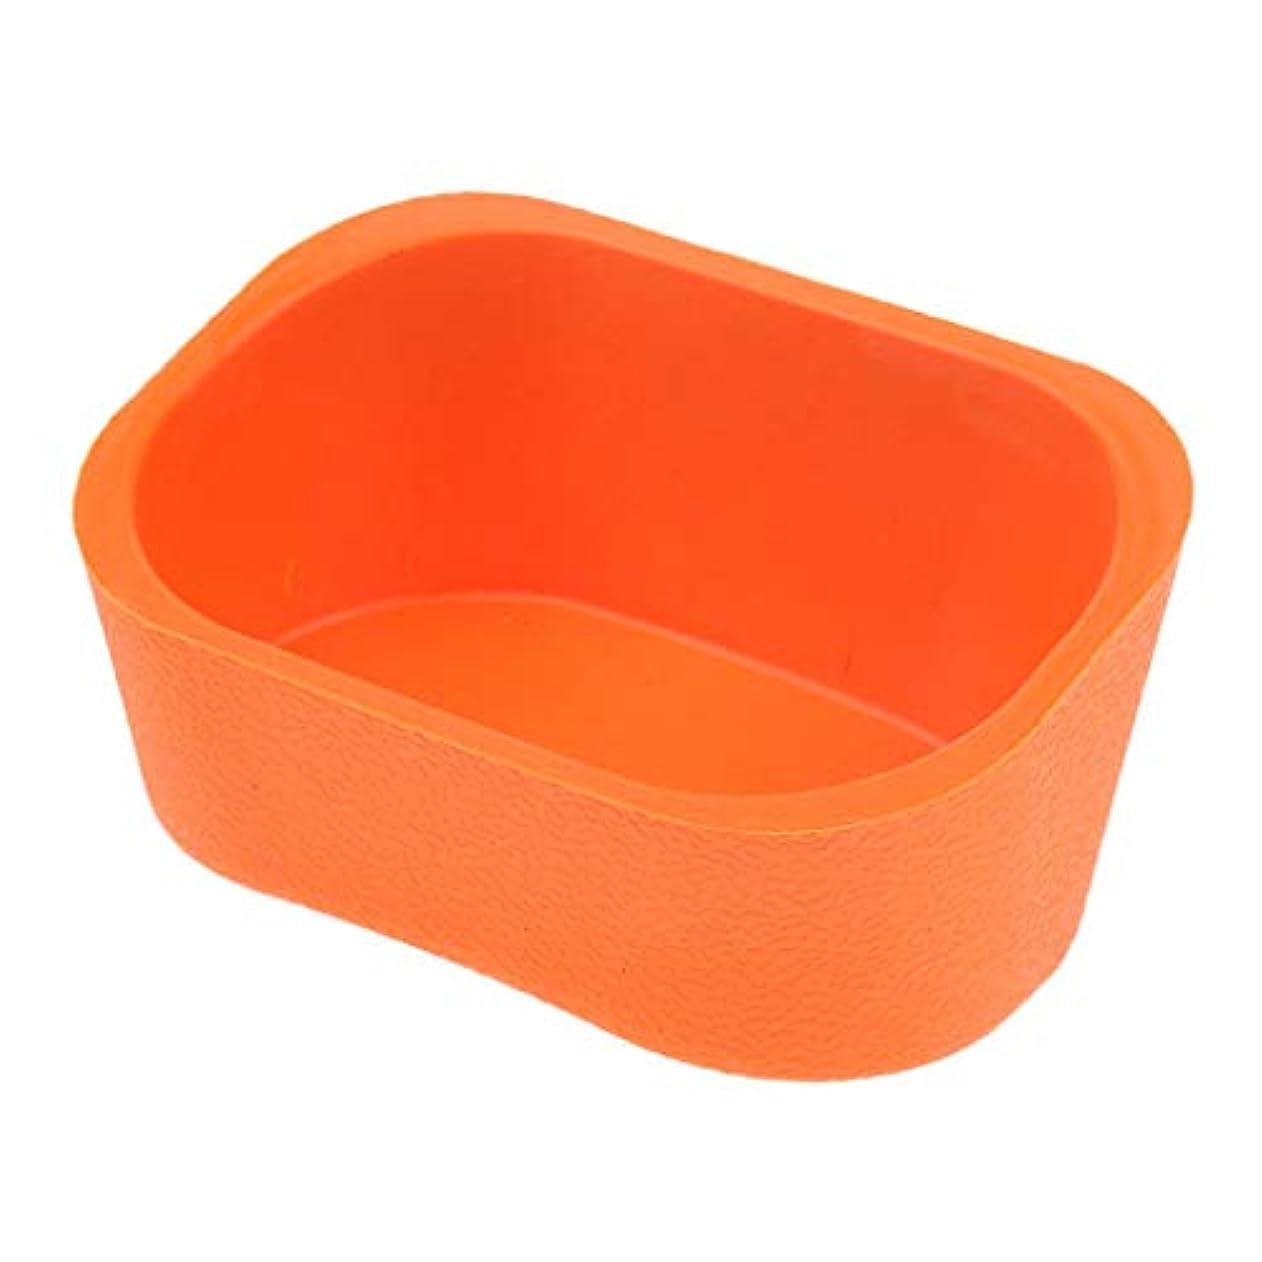 Baoblaze シャンプーボウル ネックレス クッション ピロー ヘアサロン ソフト シリコンゲル 5色選べ - オレンジ